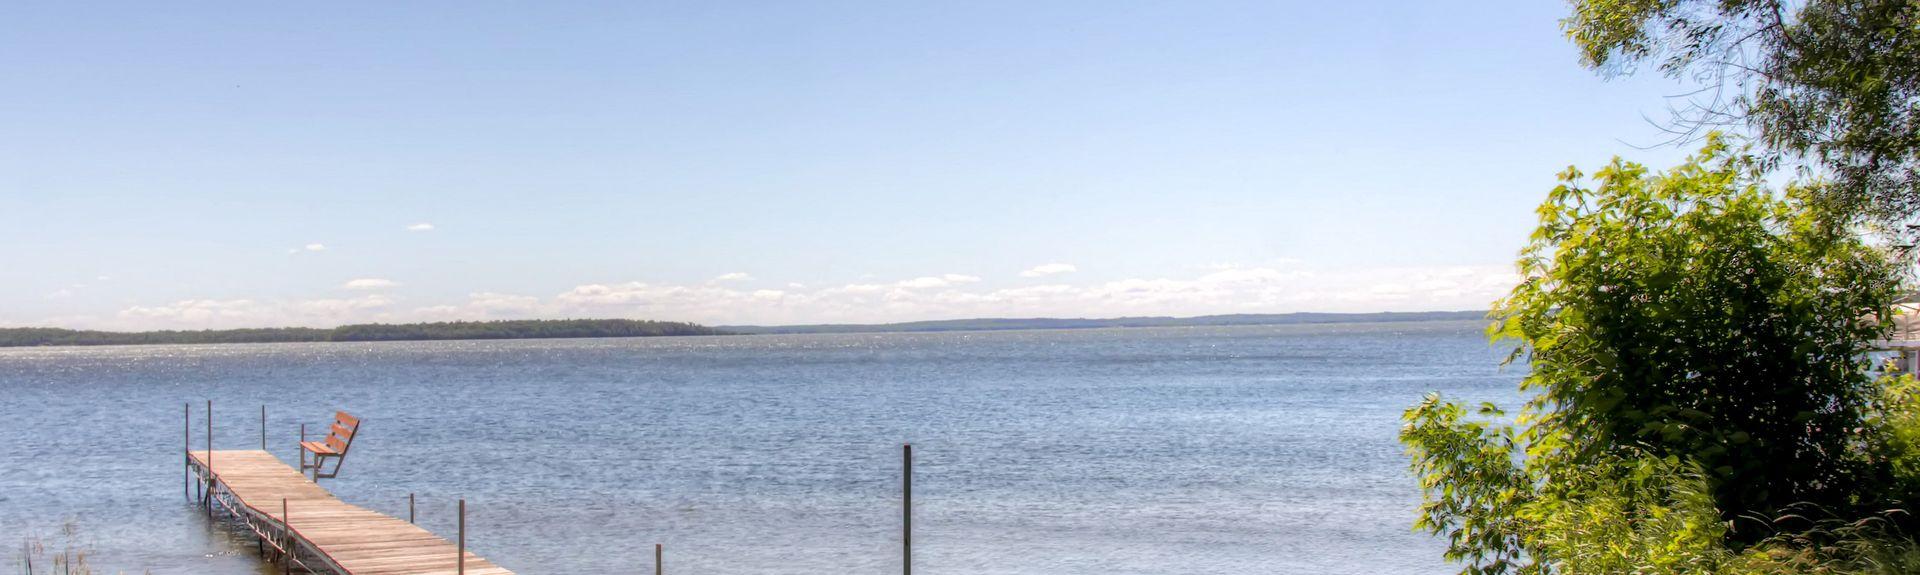 Leech Lake, Minnesota, USA